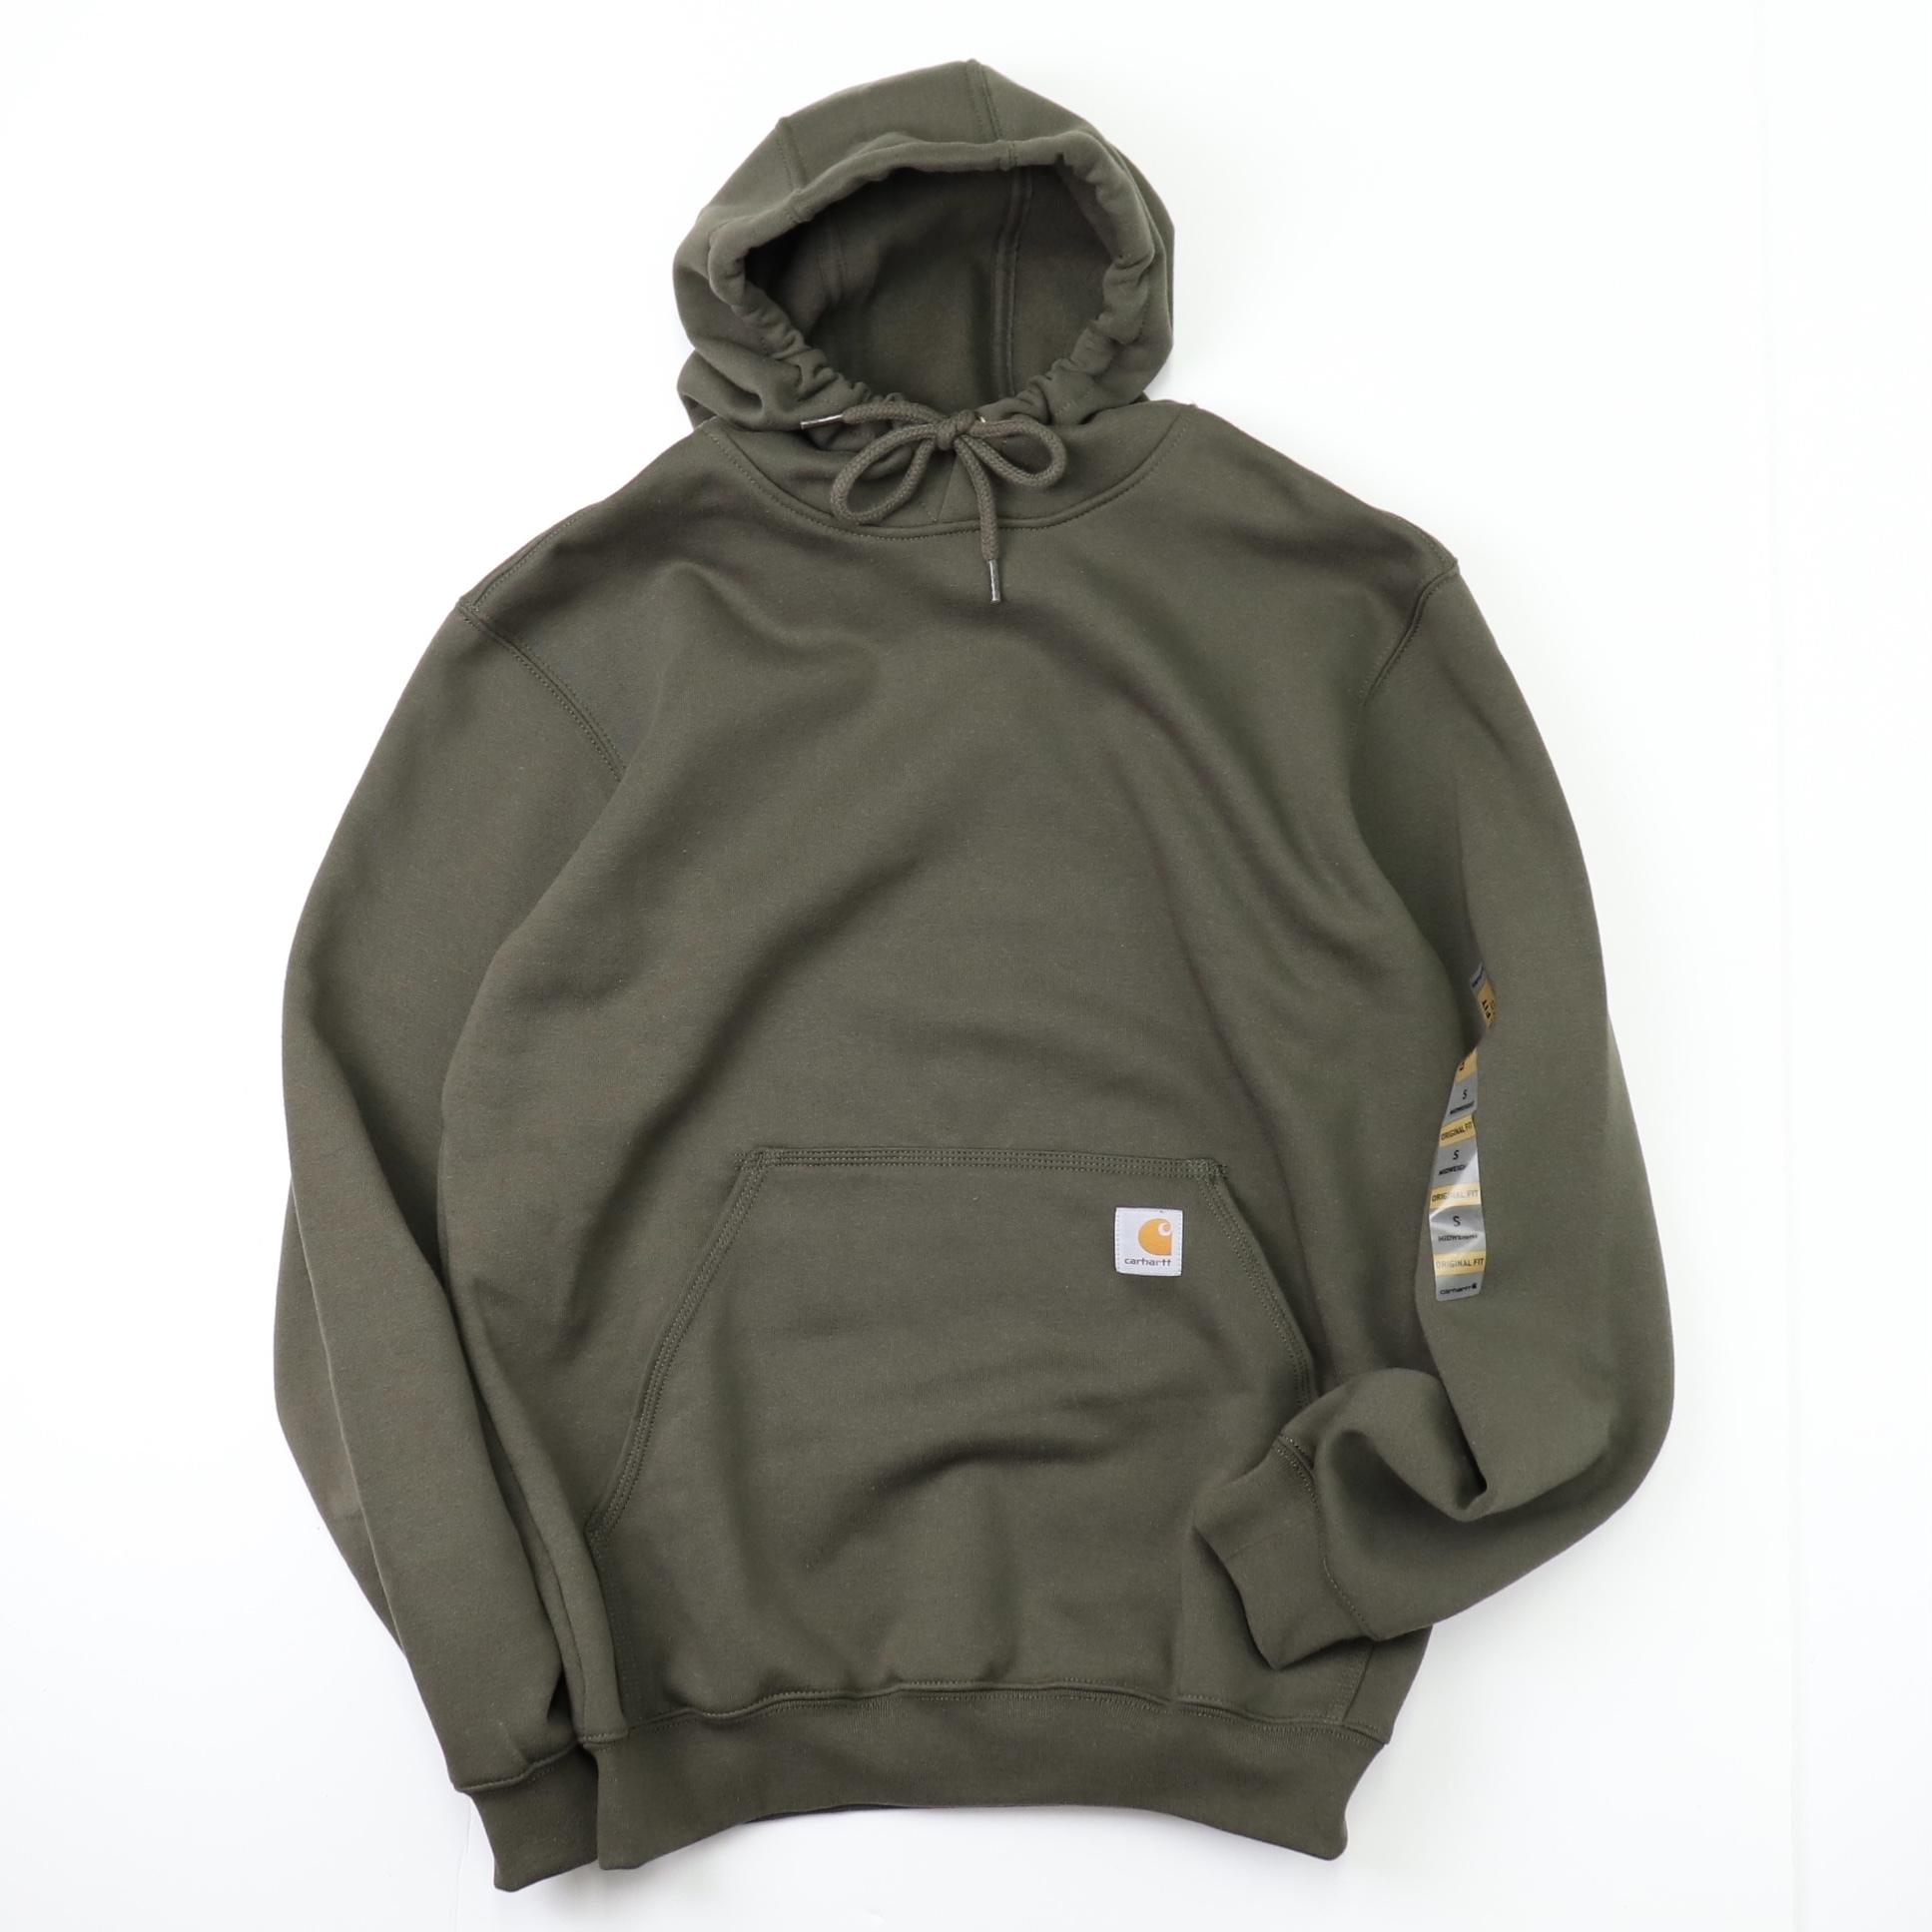 """ CARHARTT ""   Hoodie Sweatshirts   Green   カーハート フーディー ロゴスウェットパーカー グリーン USライン A682"